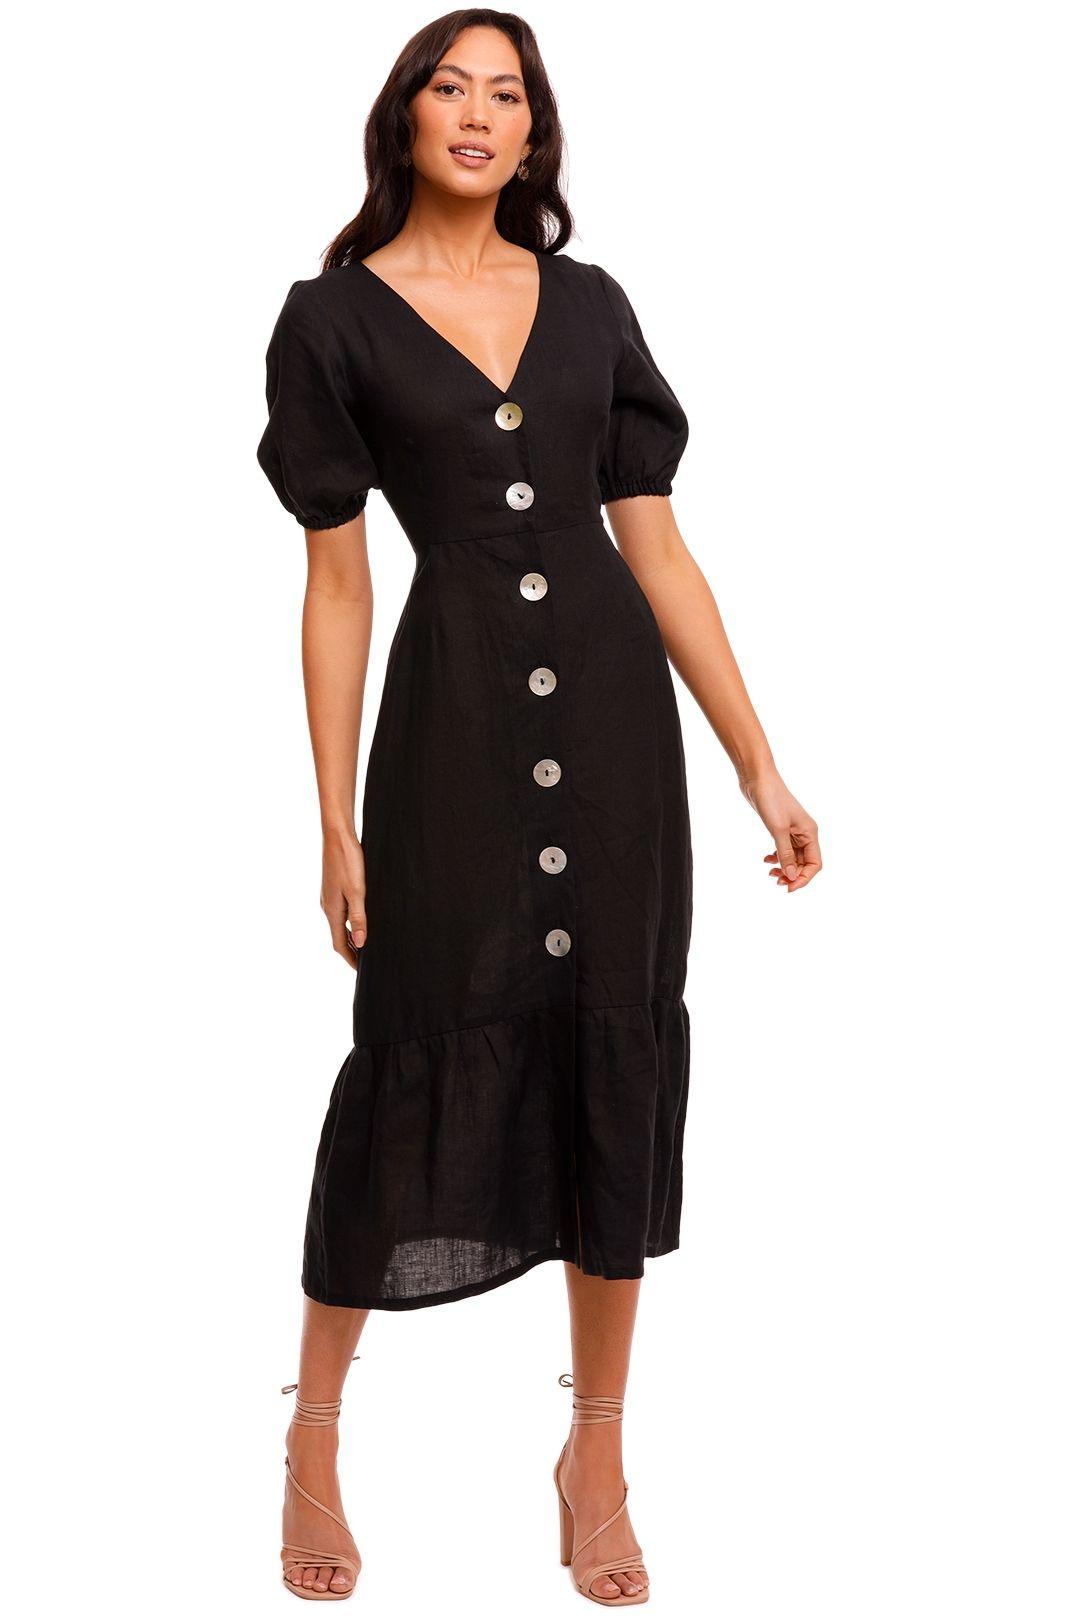 Jillian Boustred Liberty Dress Black